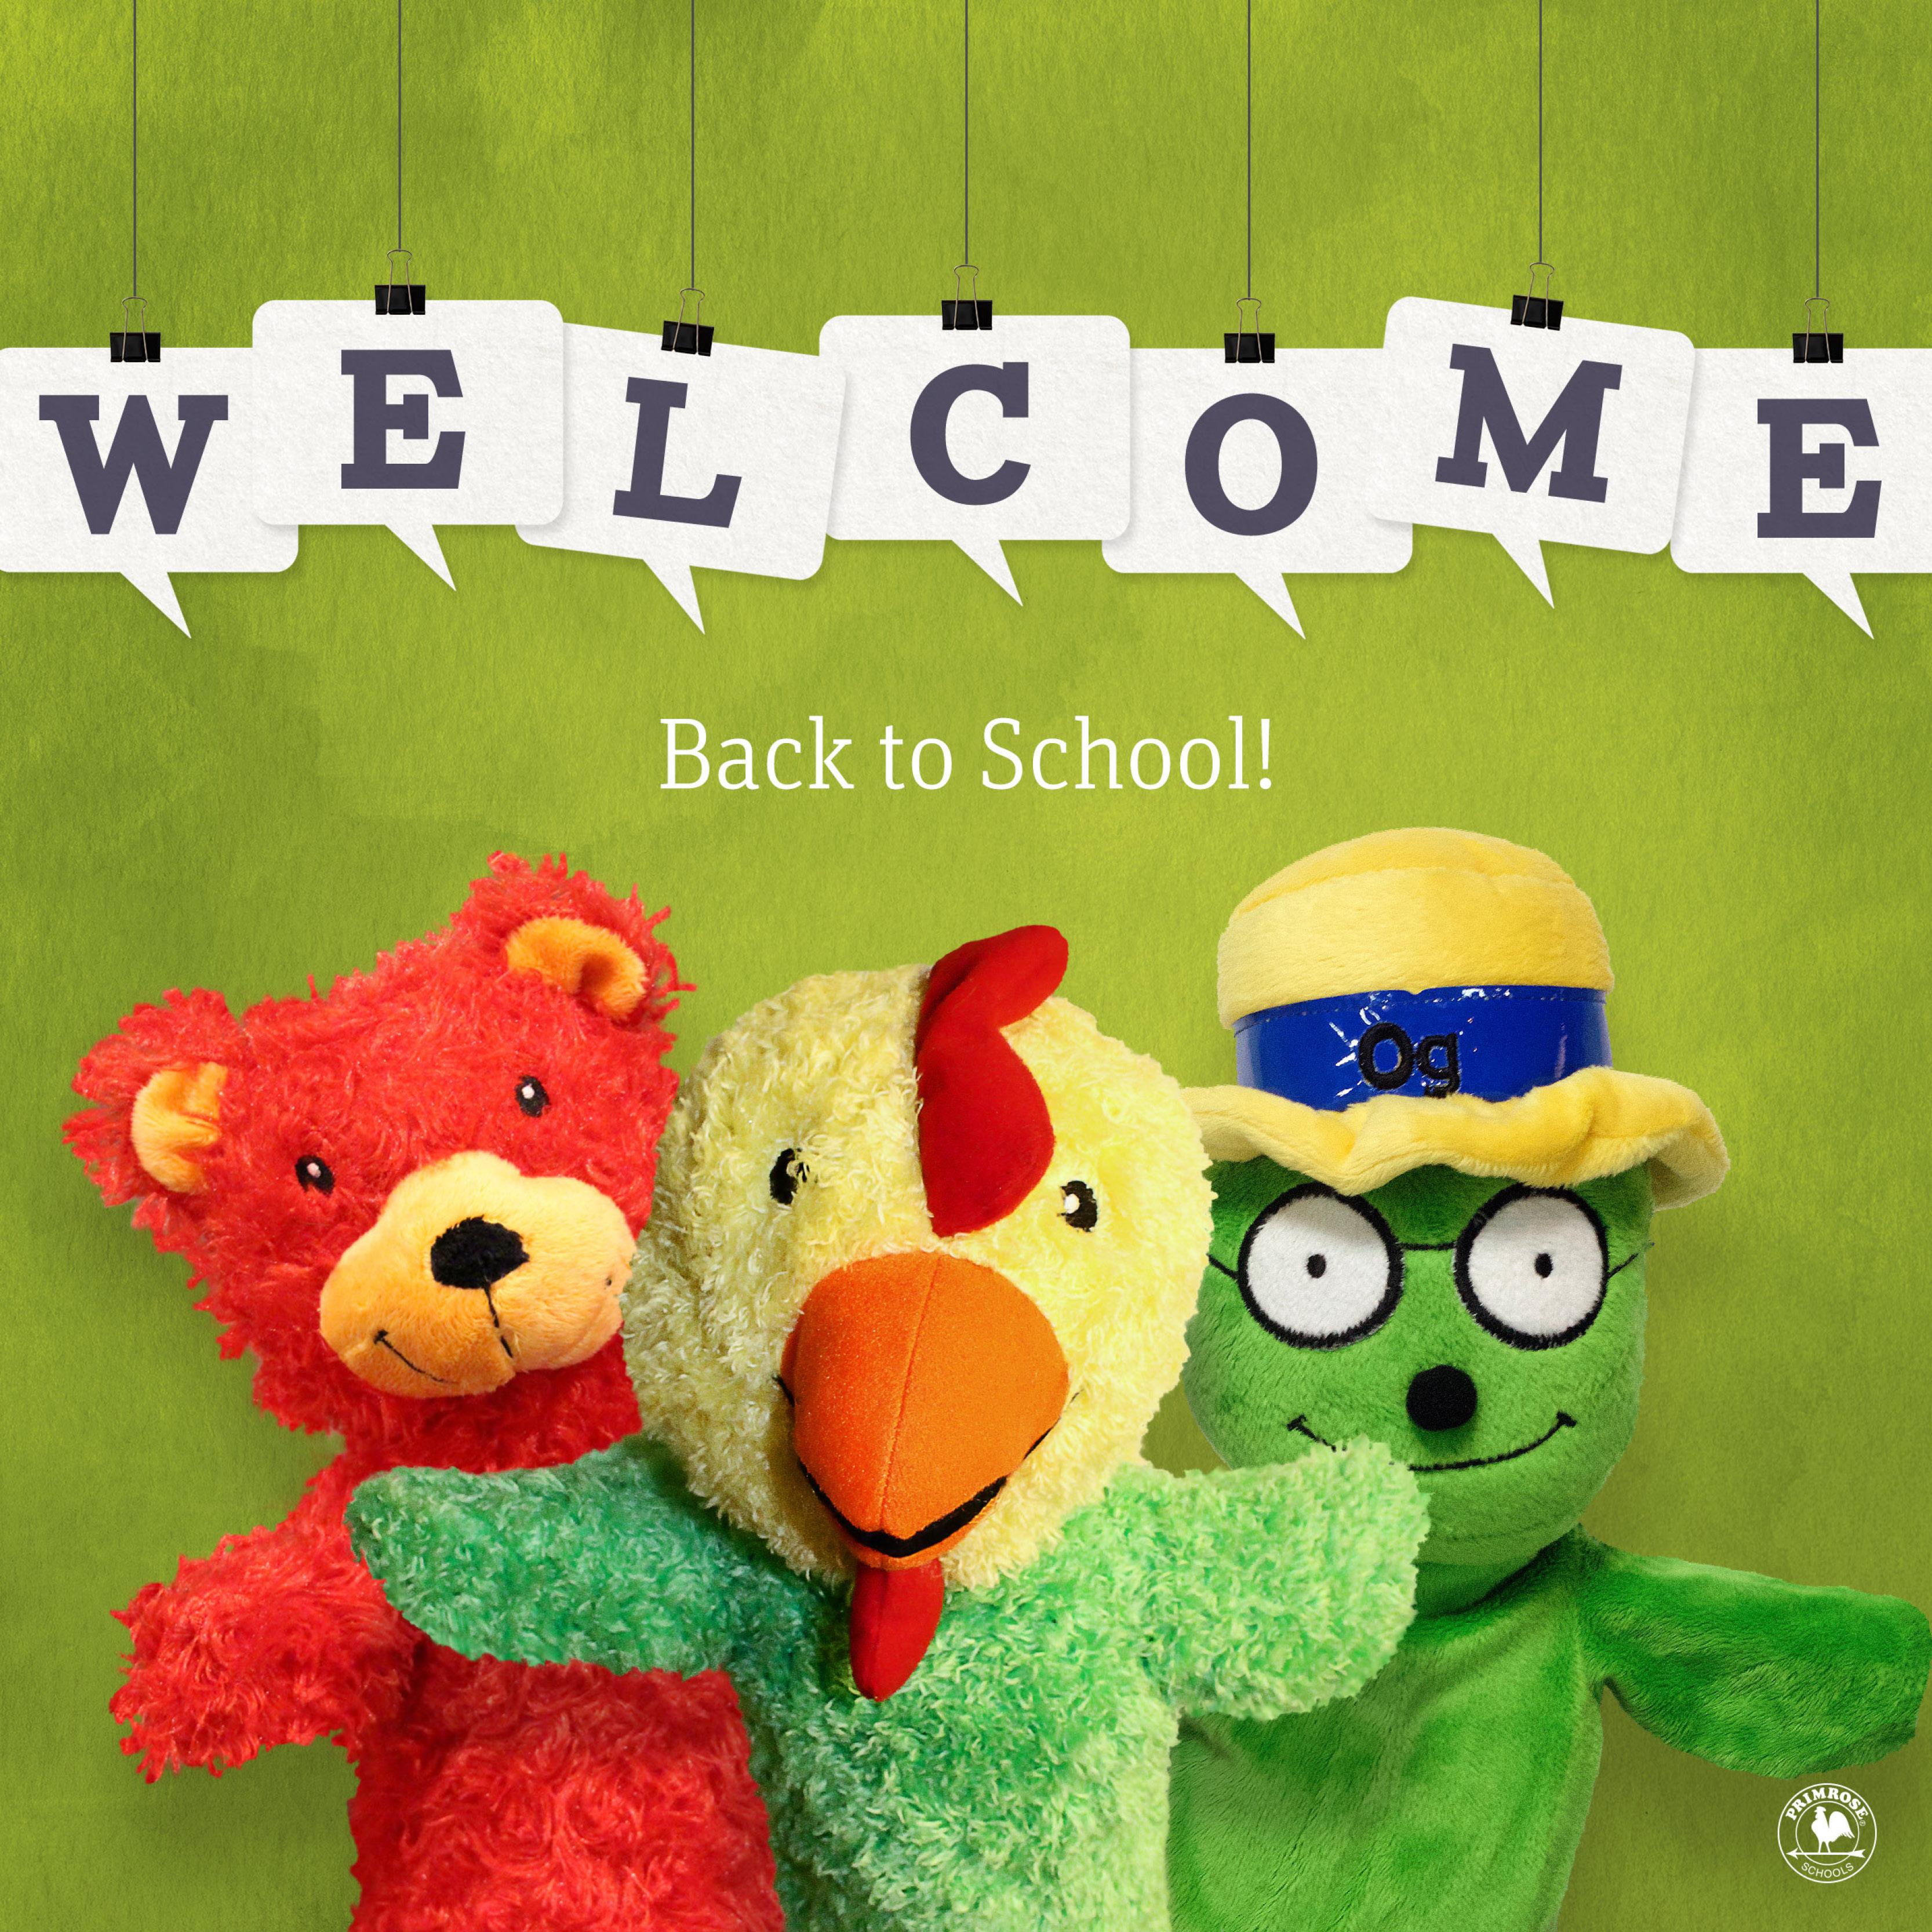 Welcome Back to School! - Primrose School of Ahwatukee | Preschool